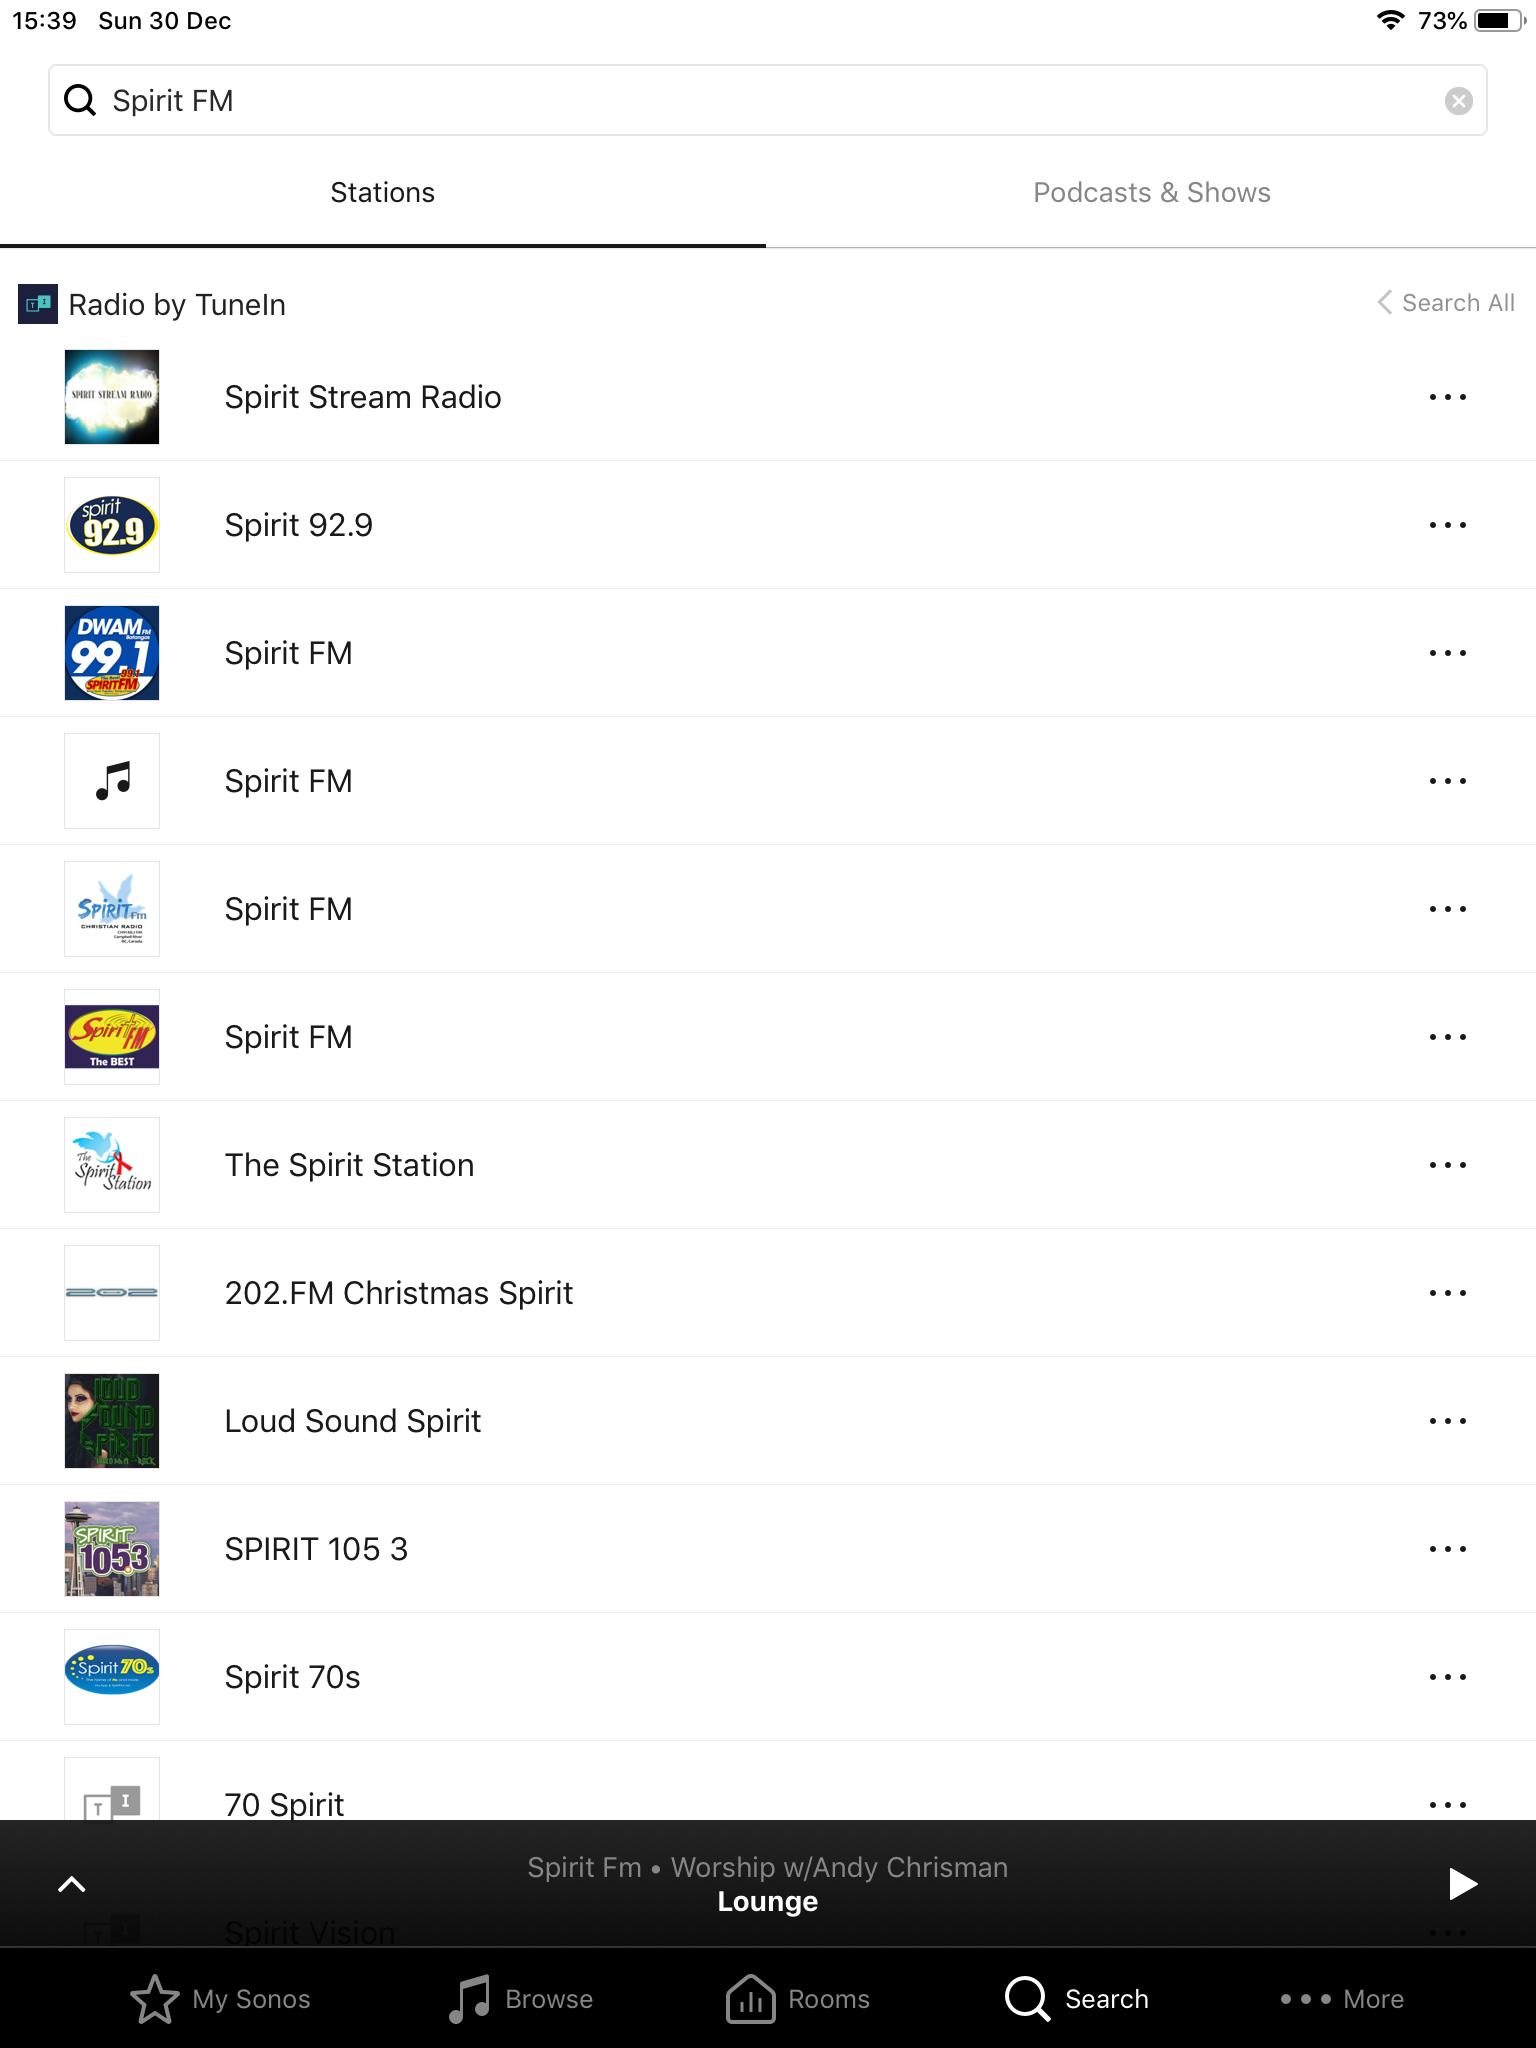 TuneIn radio station Format not supported when asking Alexa   Sonos